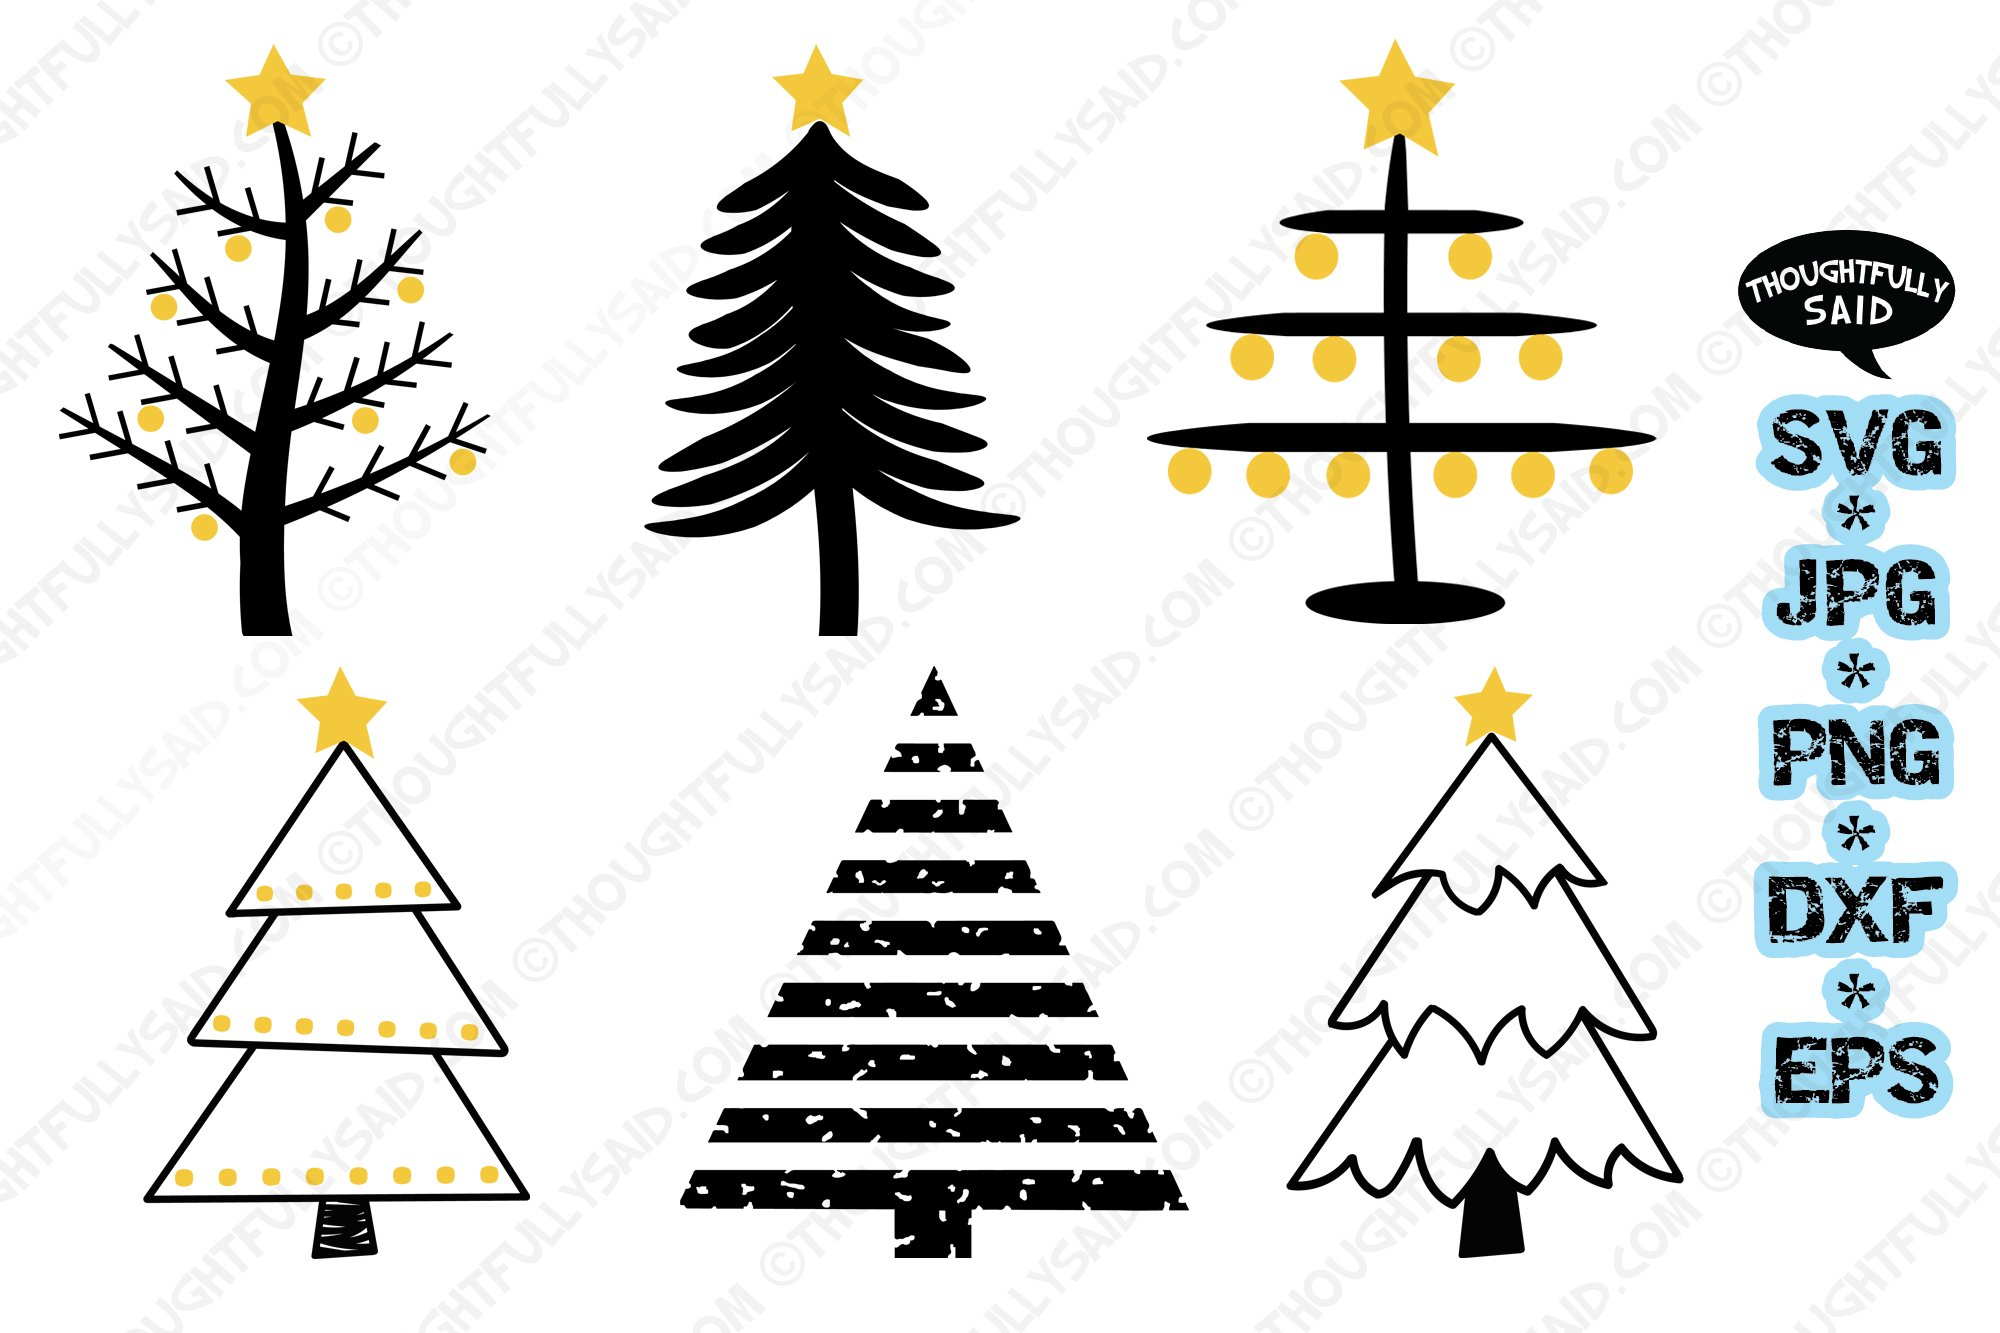 Primitive trees 4 pack SVG cut file JPG PNG DXF EPS designs example image 1